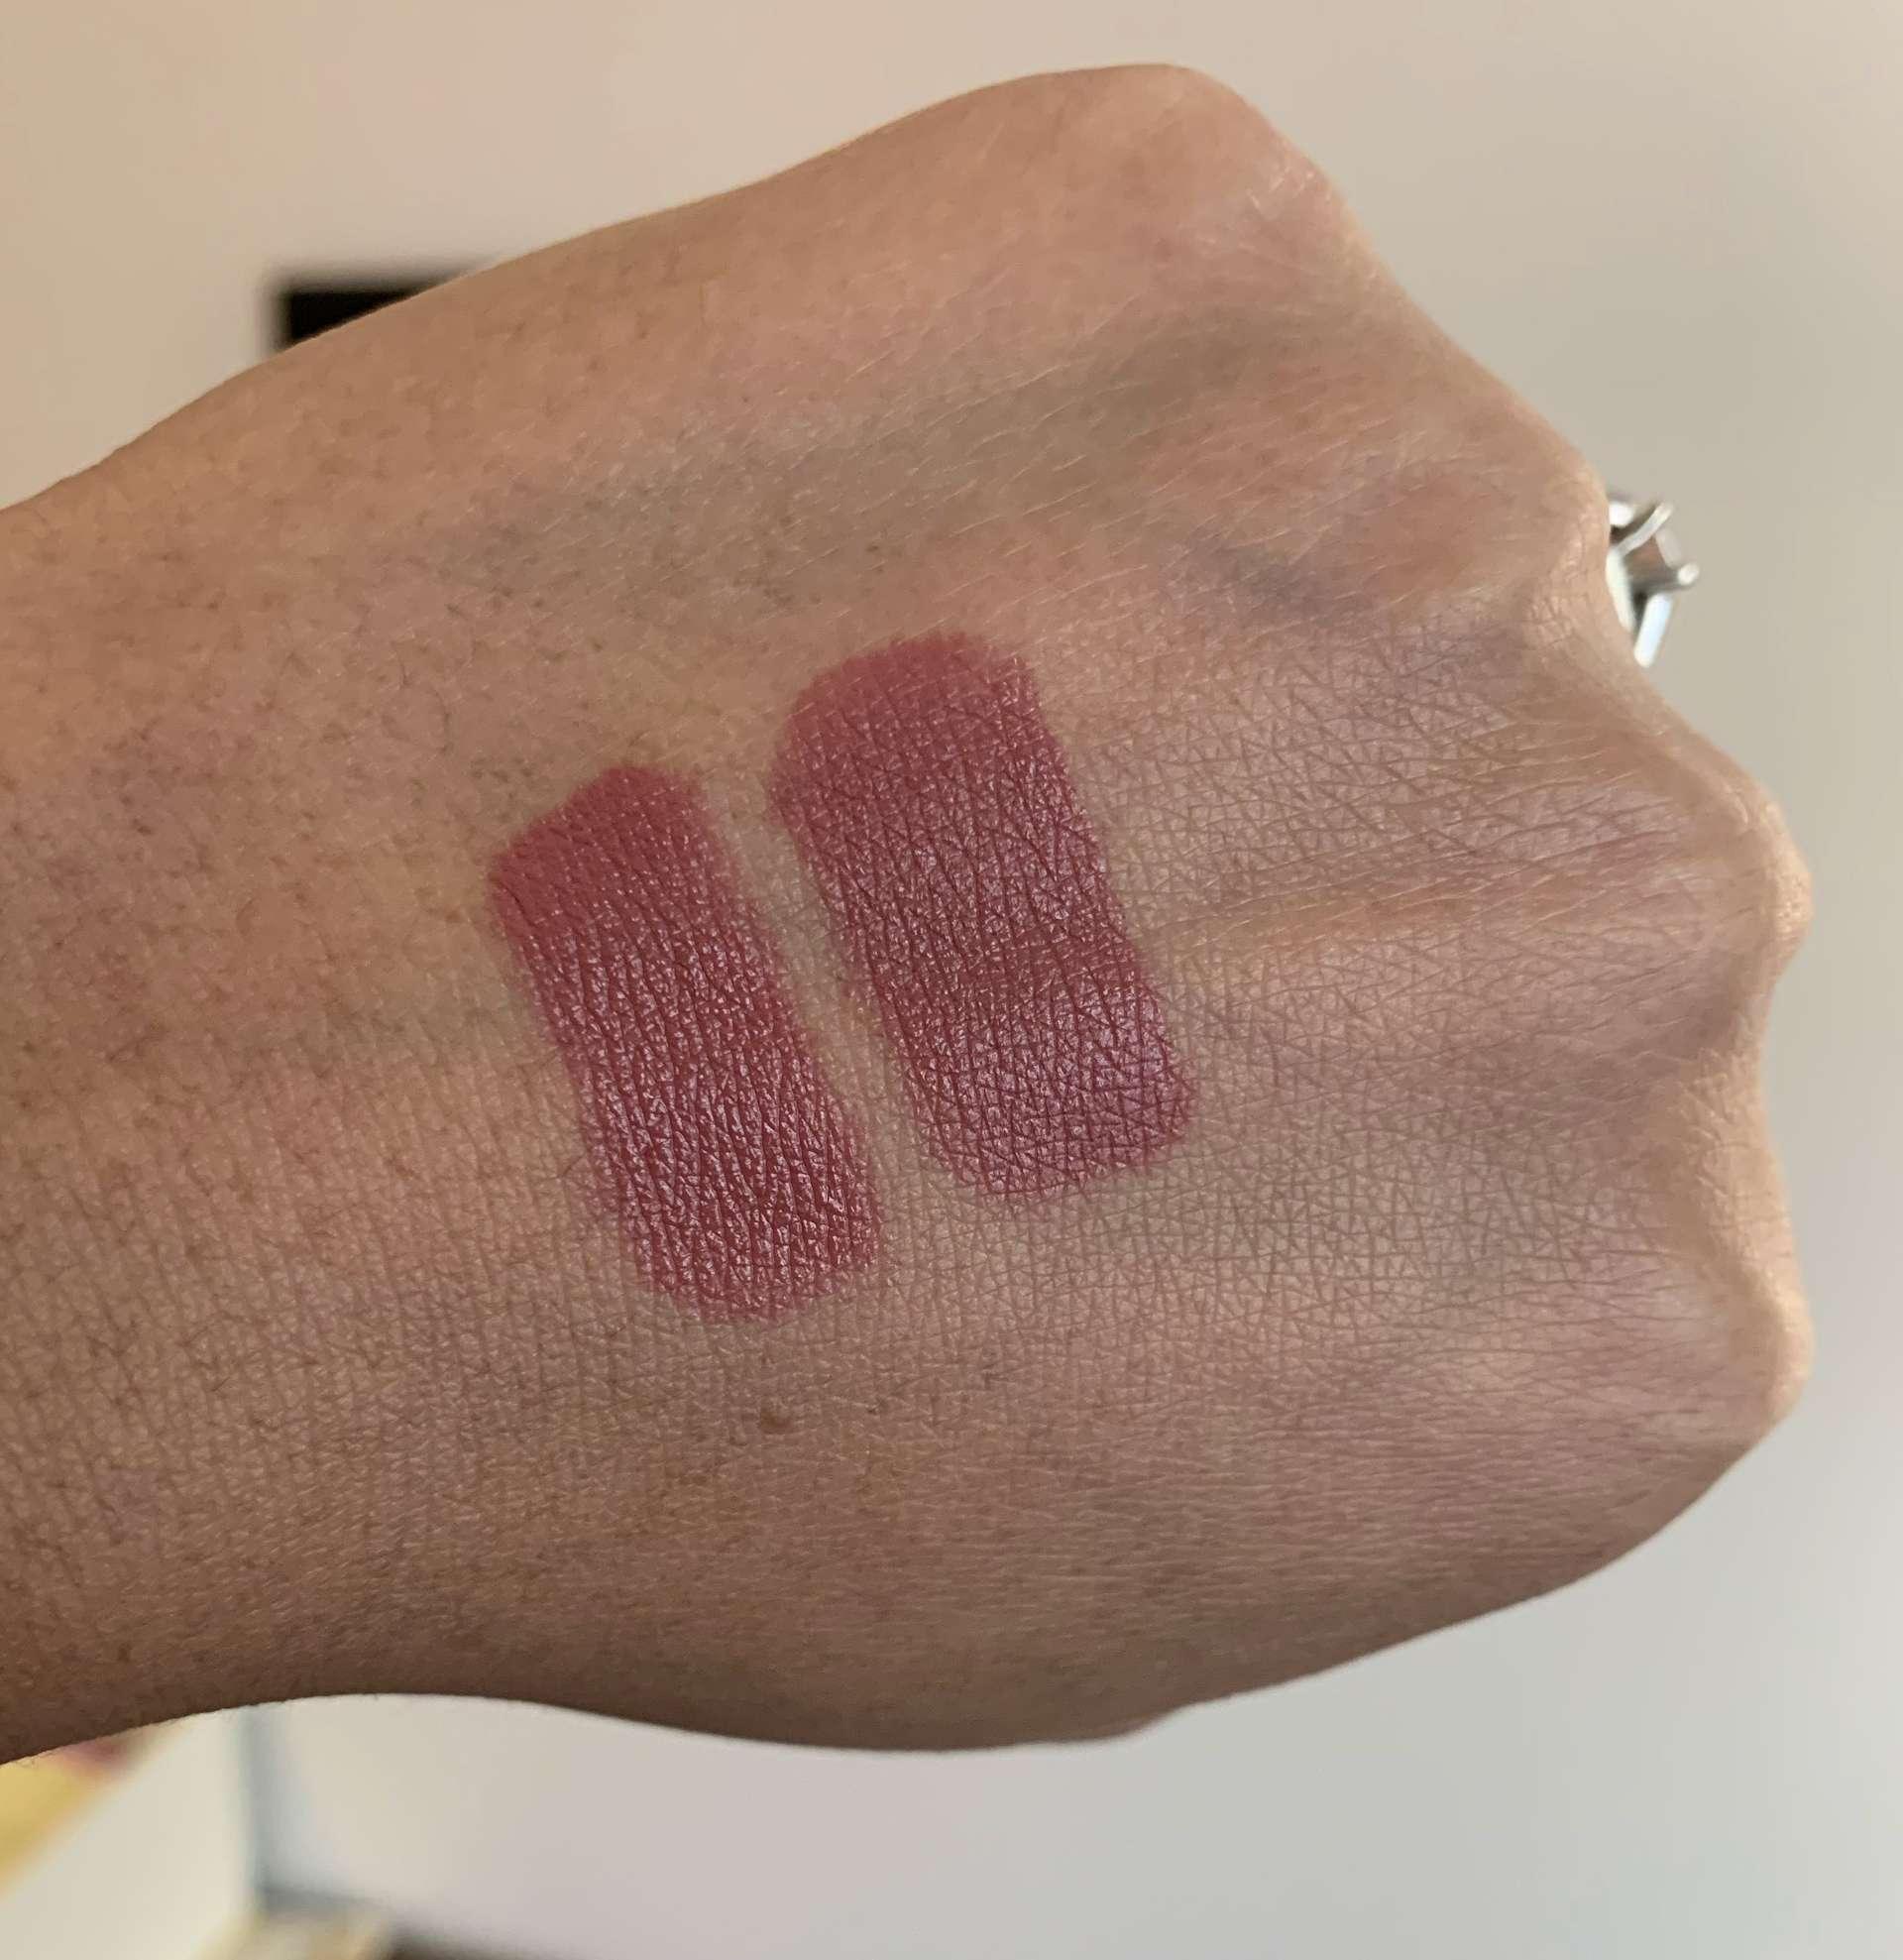 bareMinerals Mineralist Hydra Smoothing Lipstick presence vs MAC Mamastarrr lipstick swatches dark skin